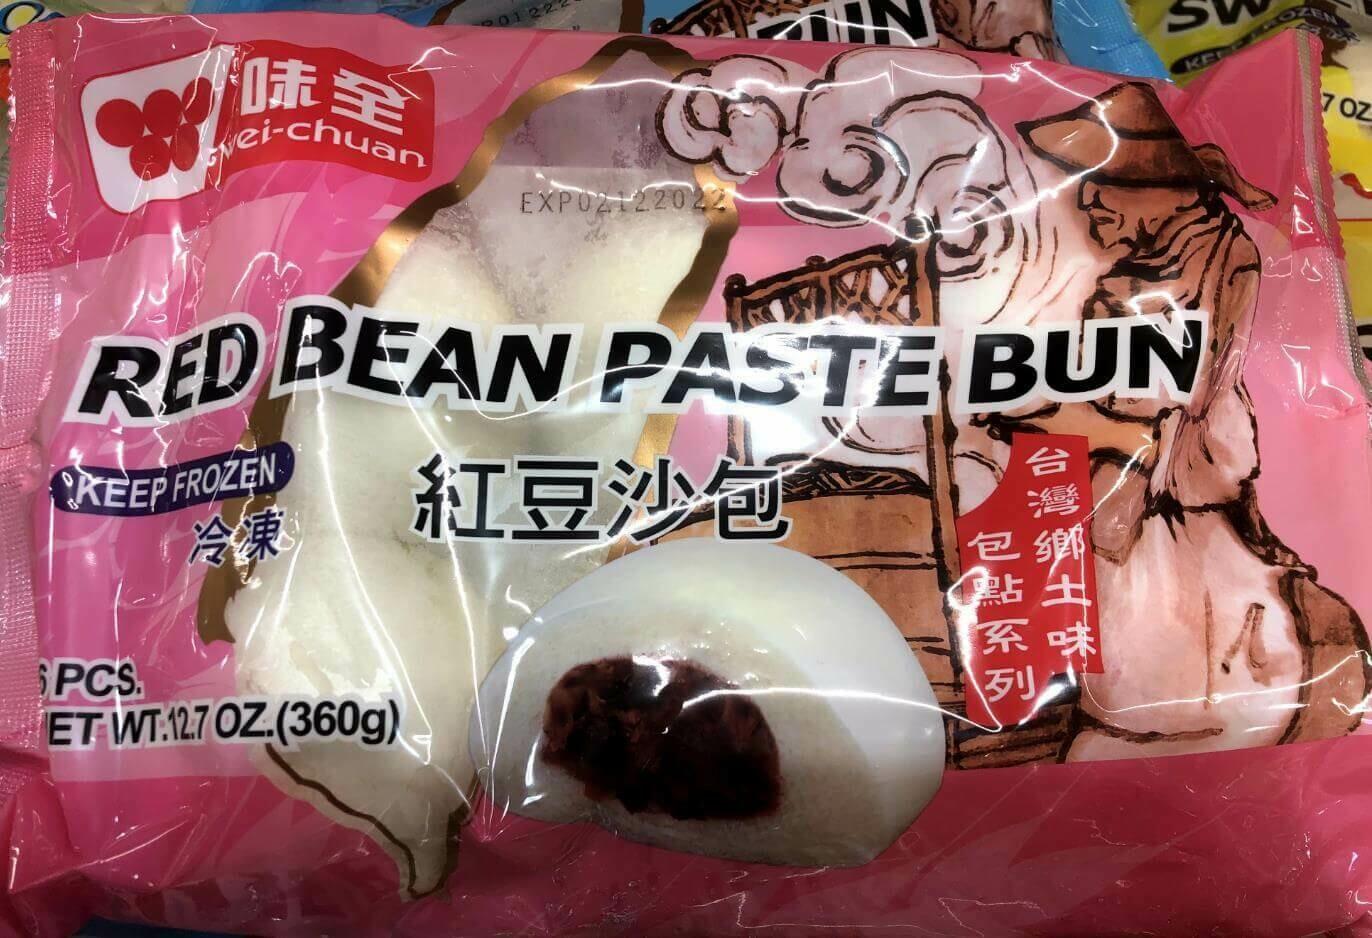 【RBF】Wei-Chuan  Red Bean Paste Bun 味全 红豆沙包 12.7oz(360g)